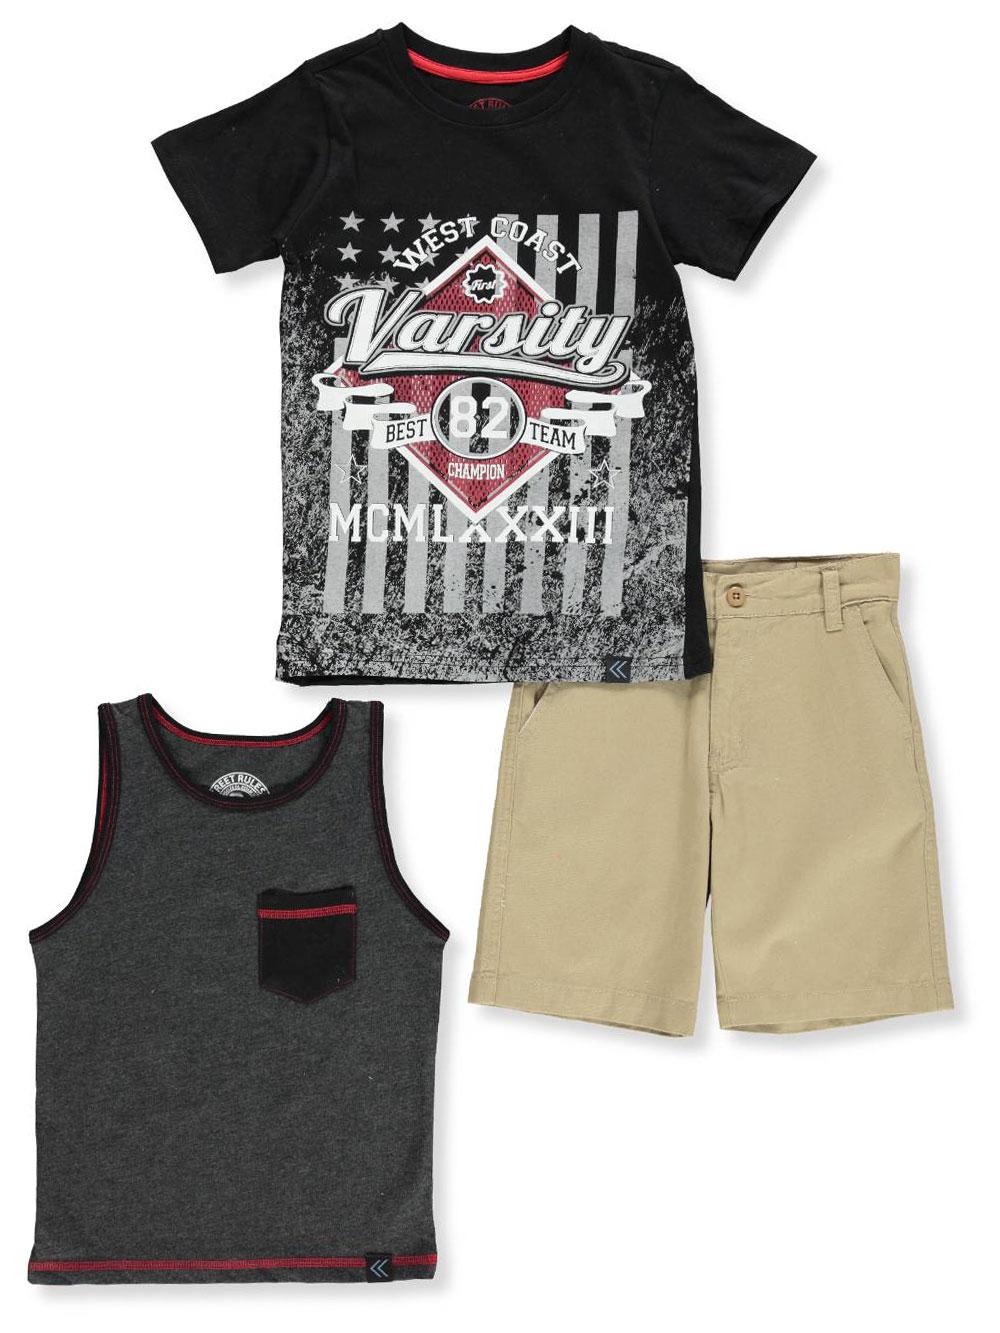 913495bdad4c Street Rules Boys' 3-Piece Shorts Set Outfit